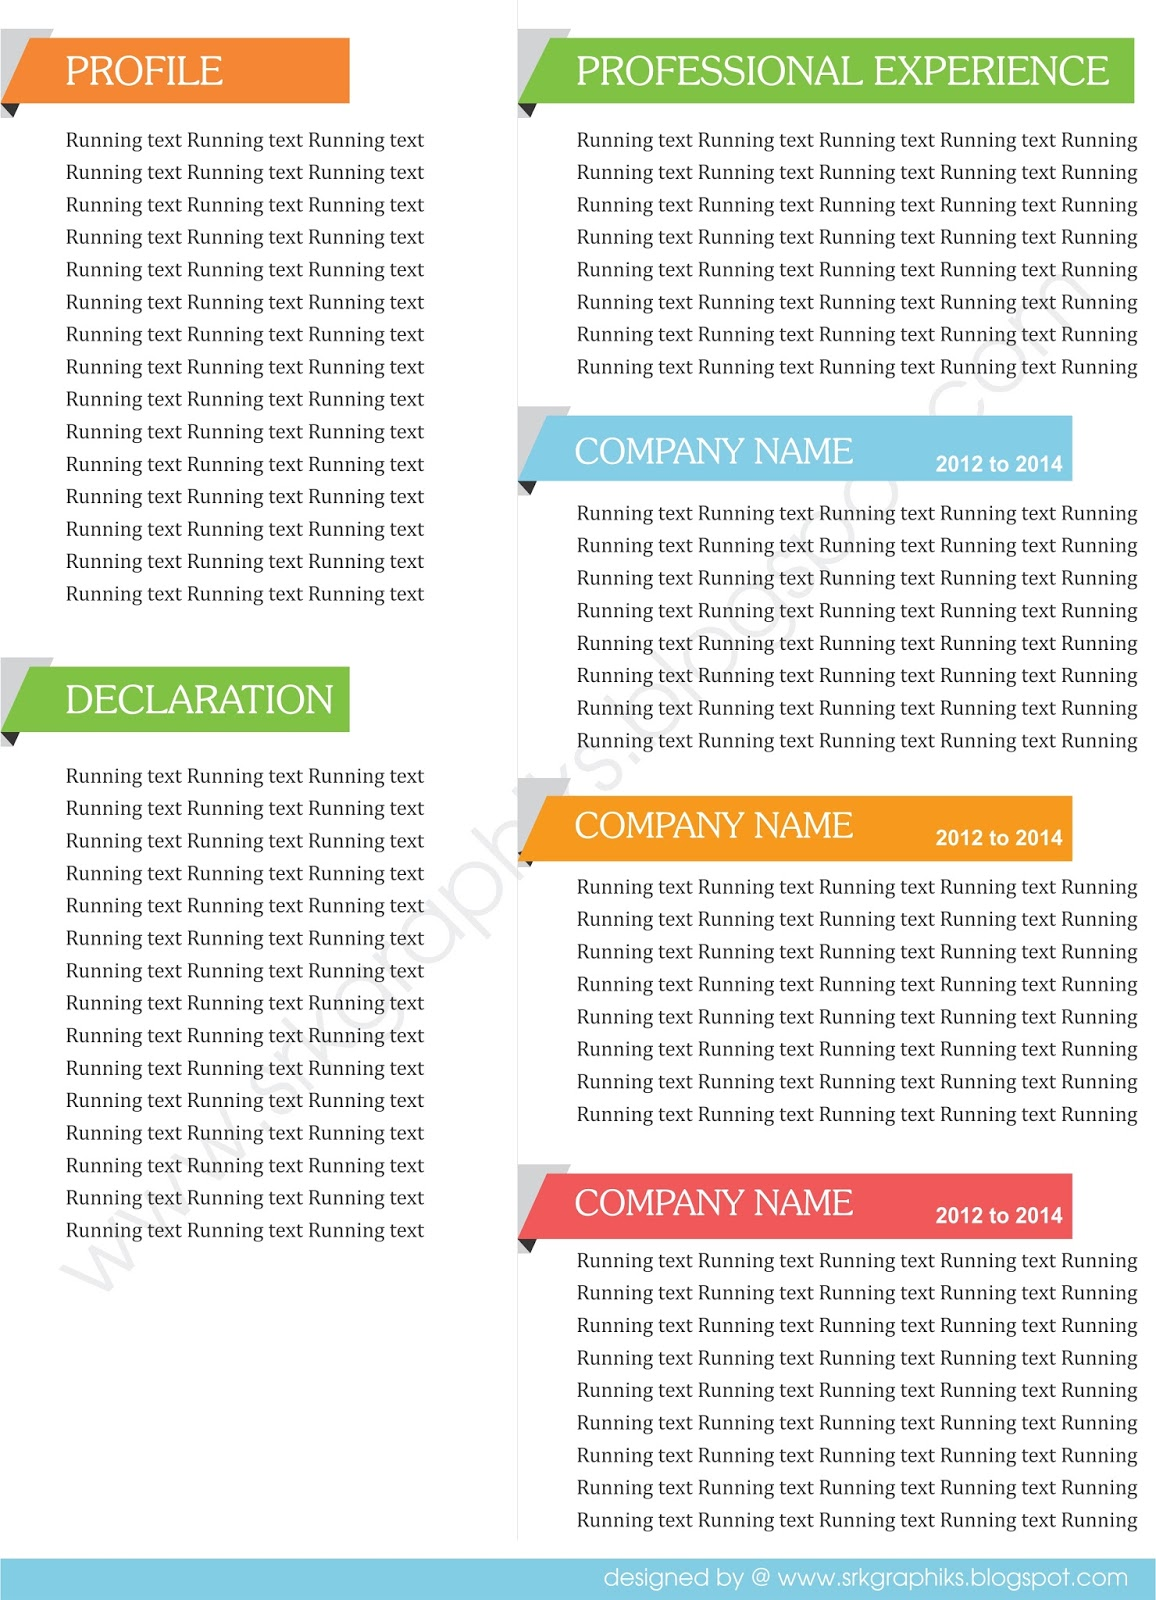 corporate resume templates - Corporate Resume Templates